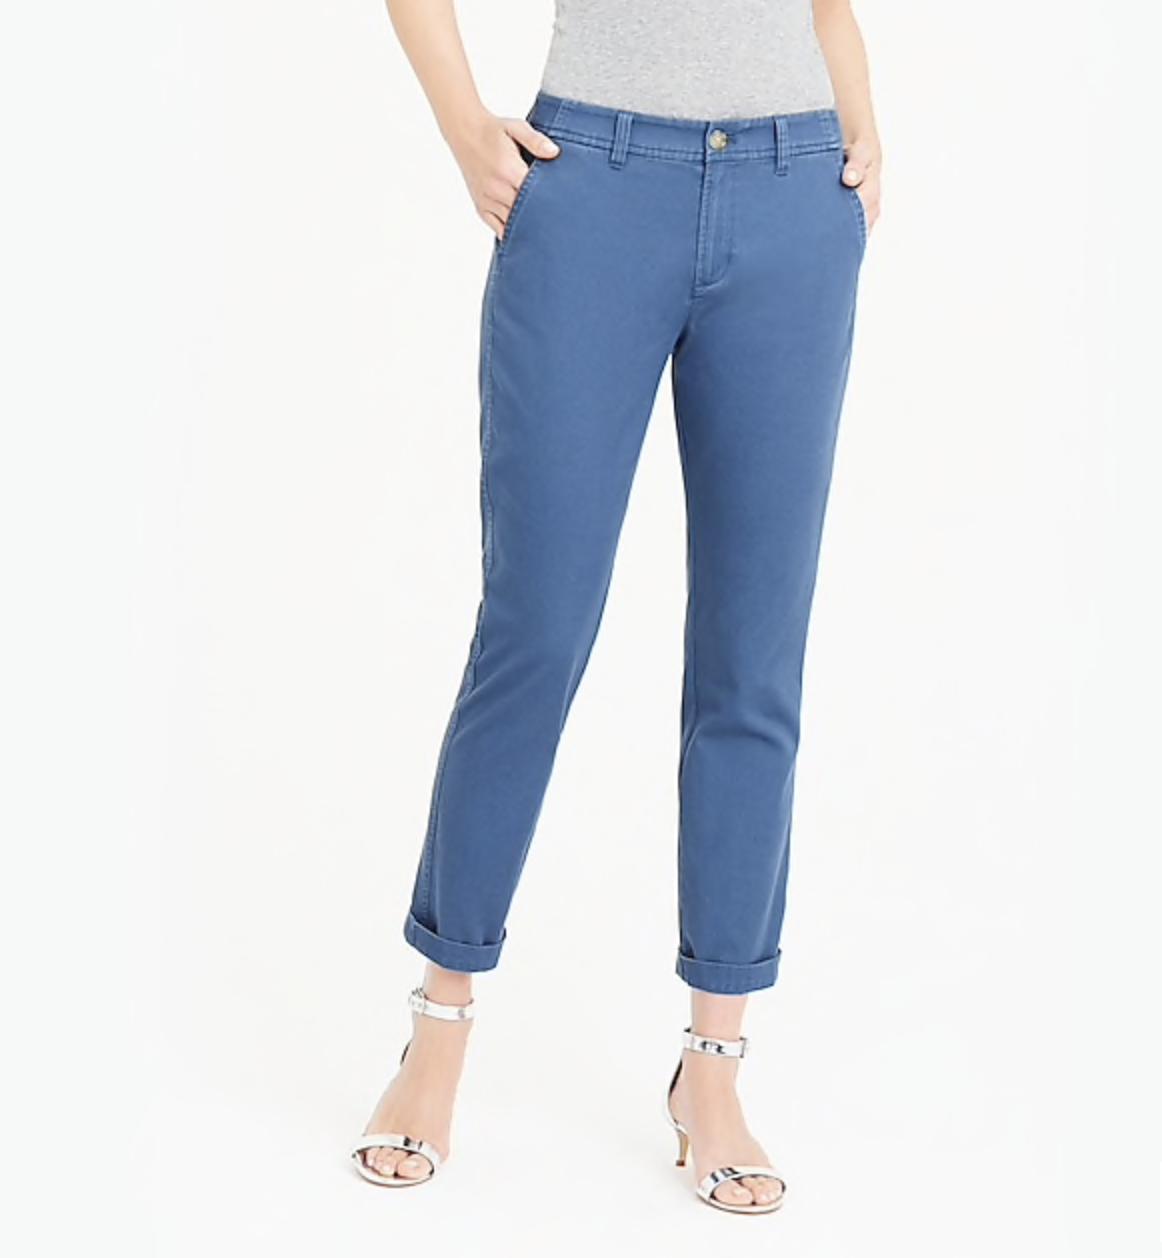 perfect blue khaki style pants